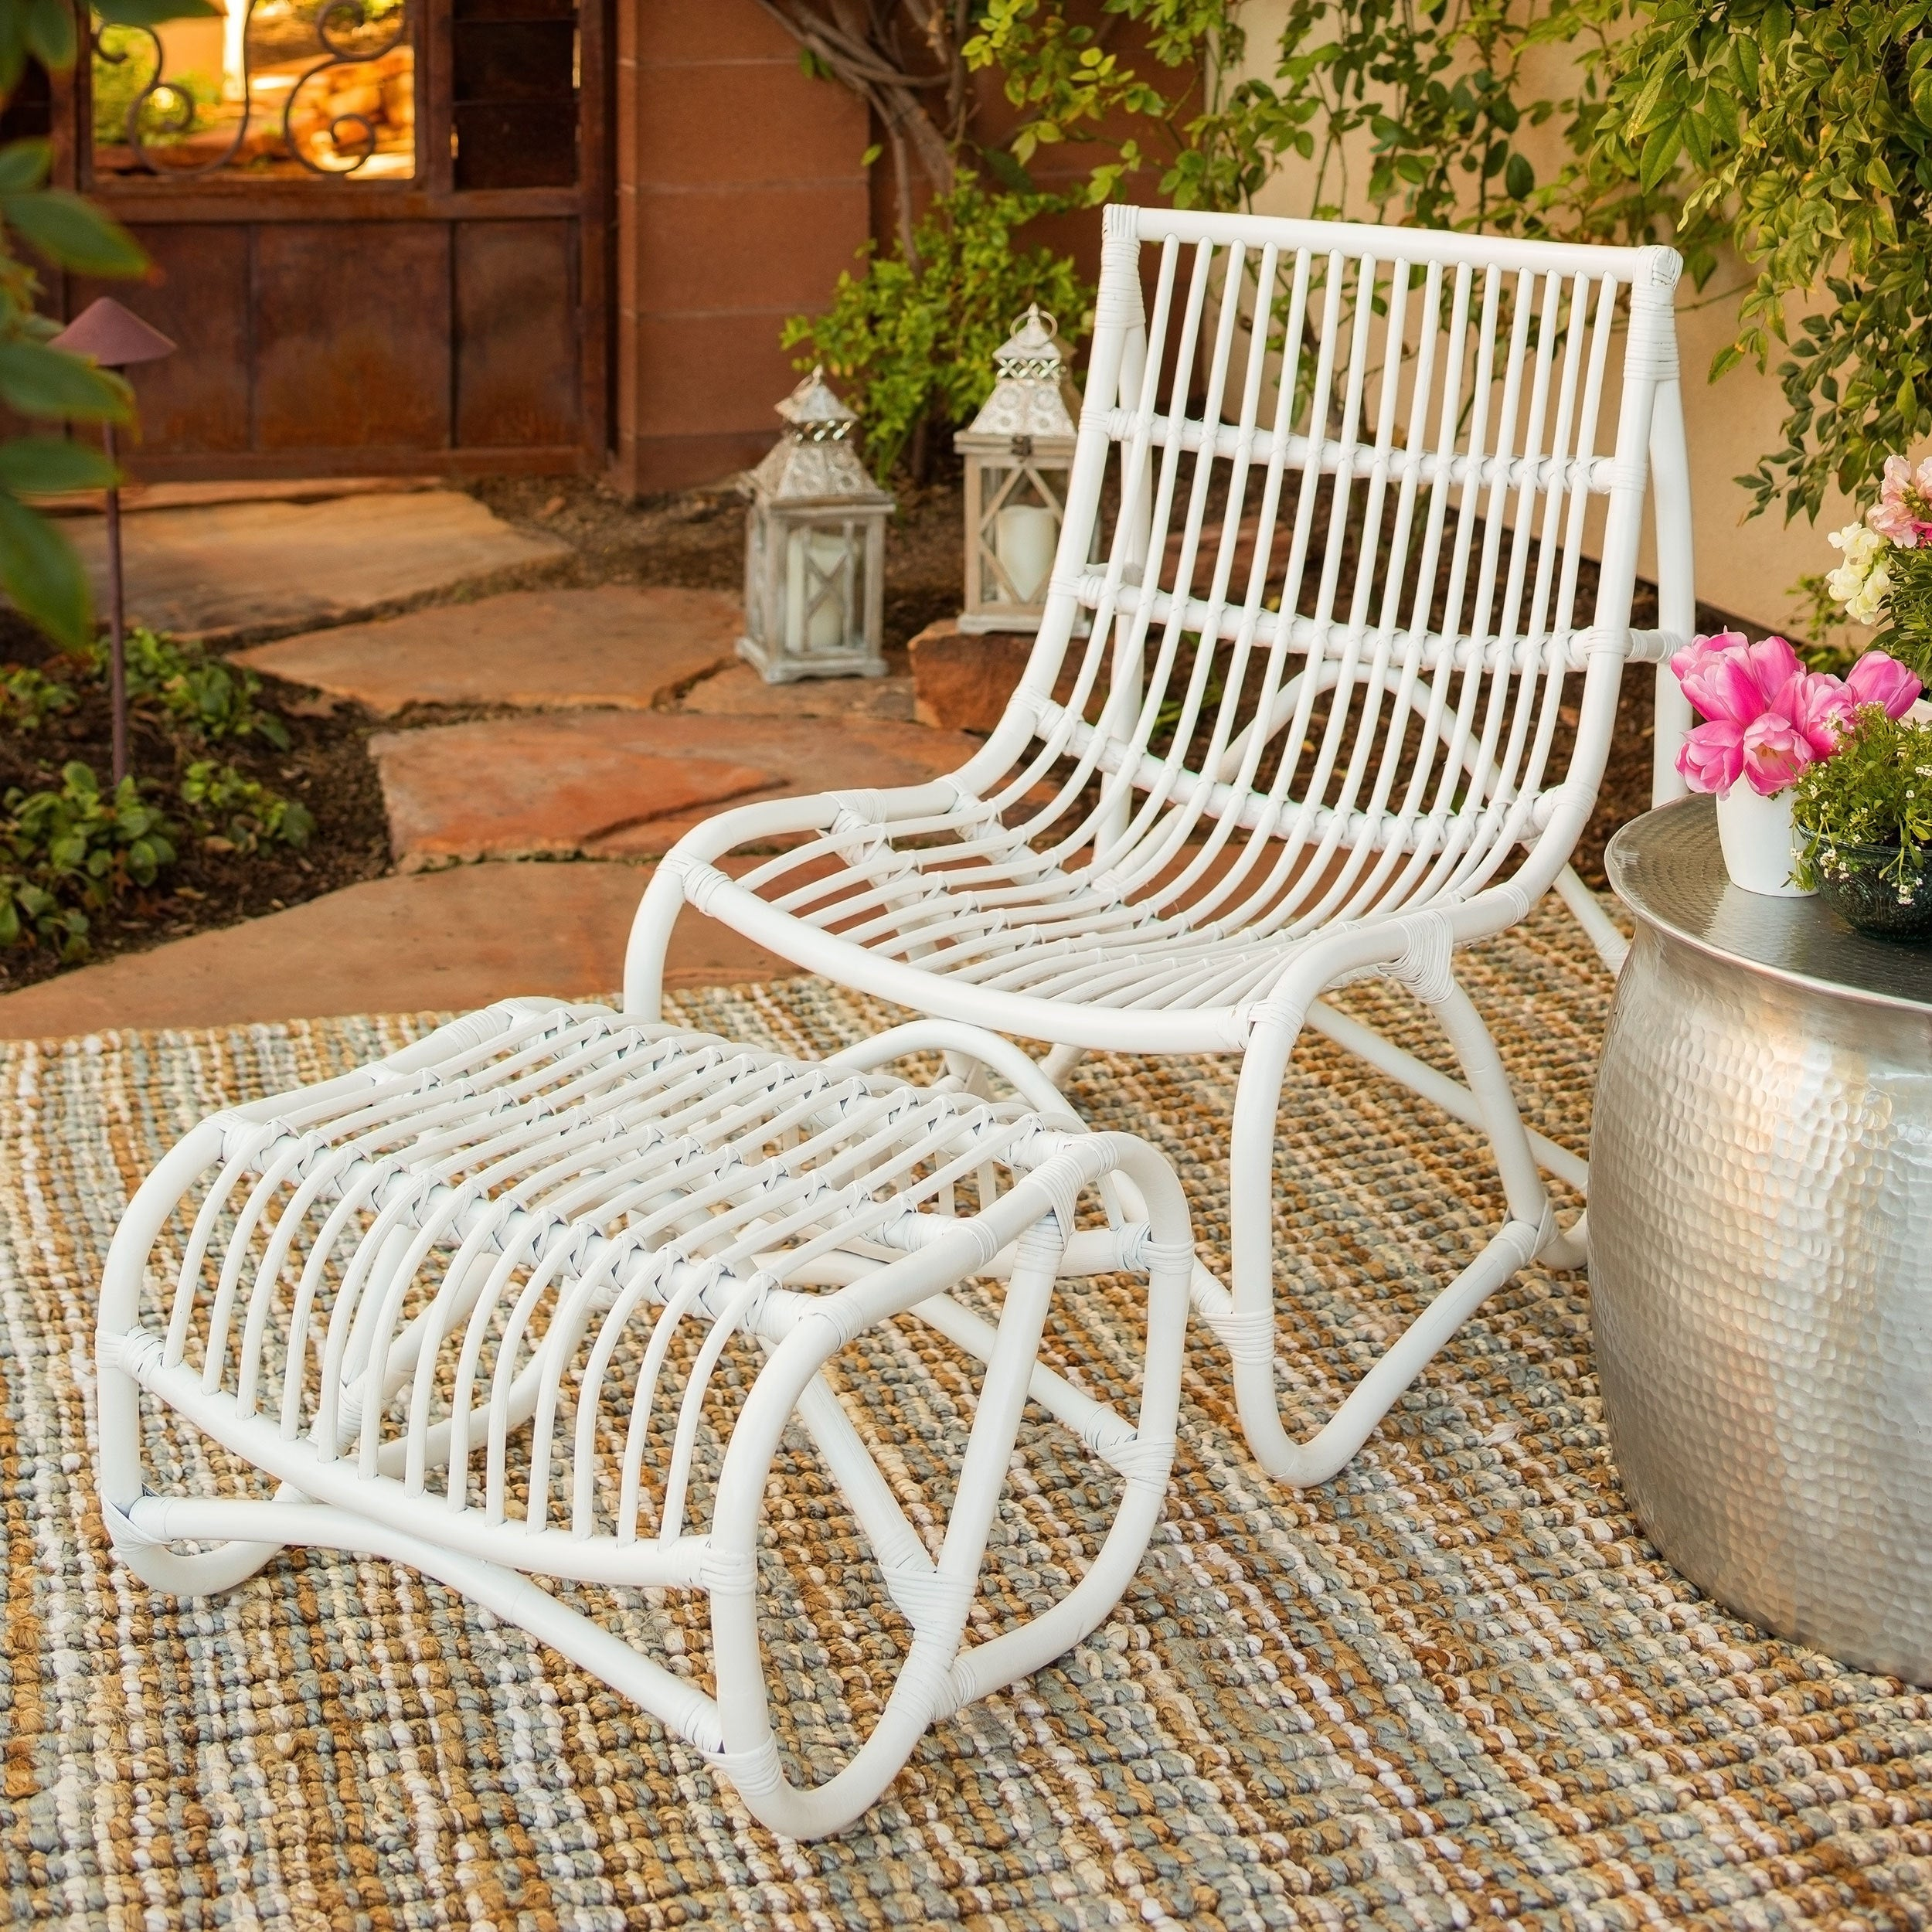 Safavieh Shenandoah White Wicker Chair And Ottoman Set